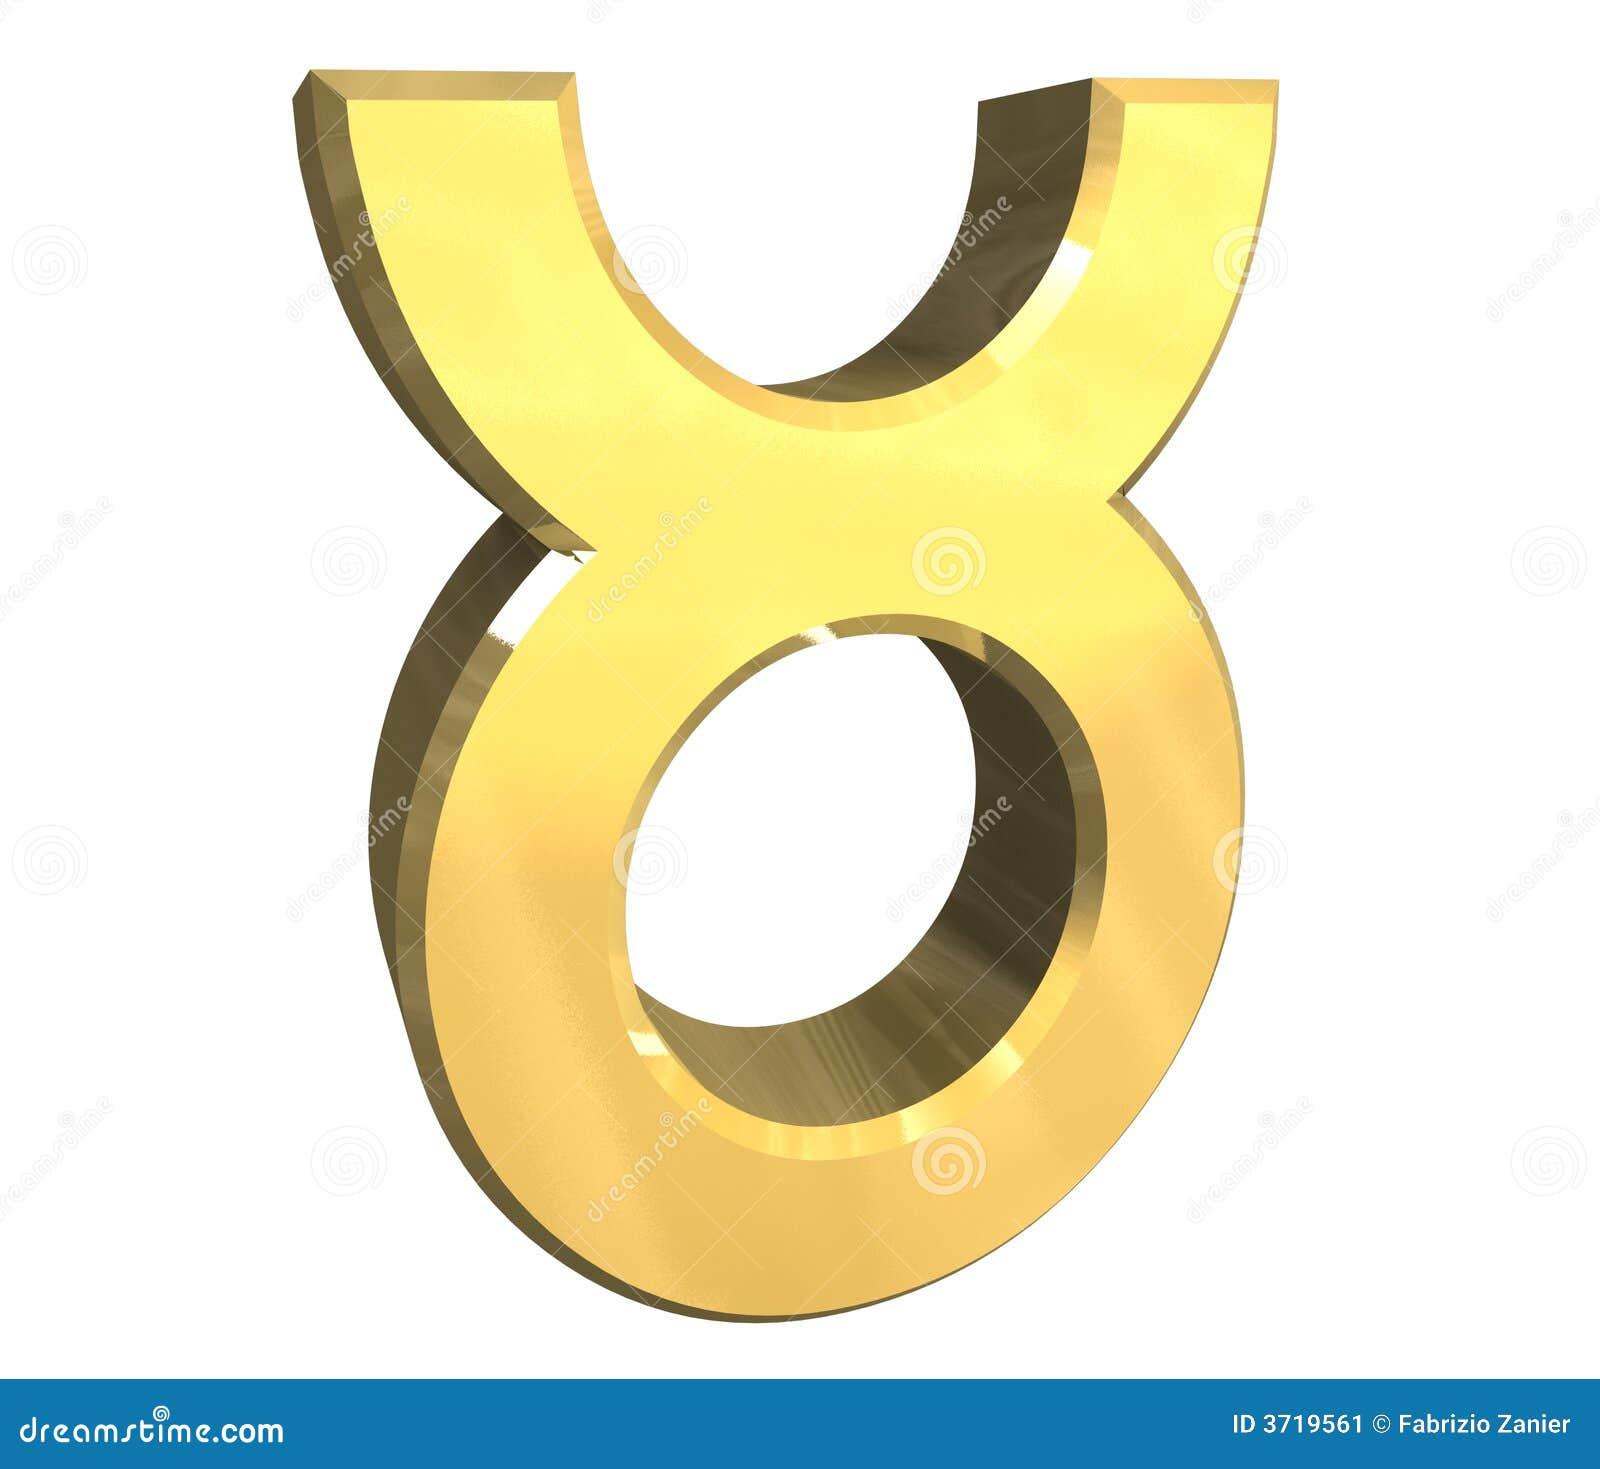 Taurus Astrology Symbol In Gold 3d Stock Illustration